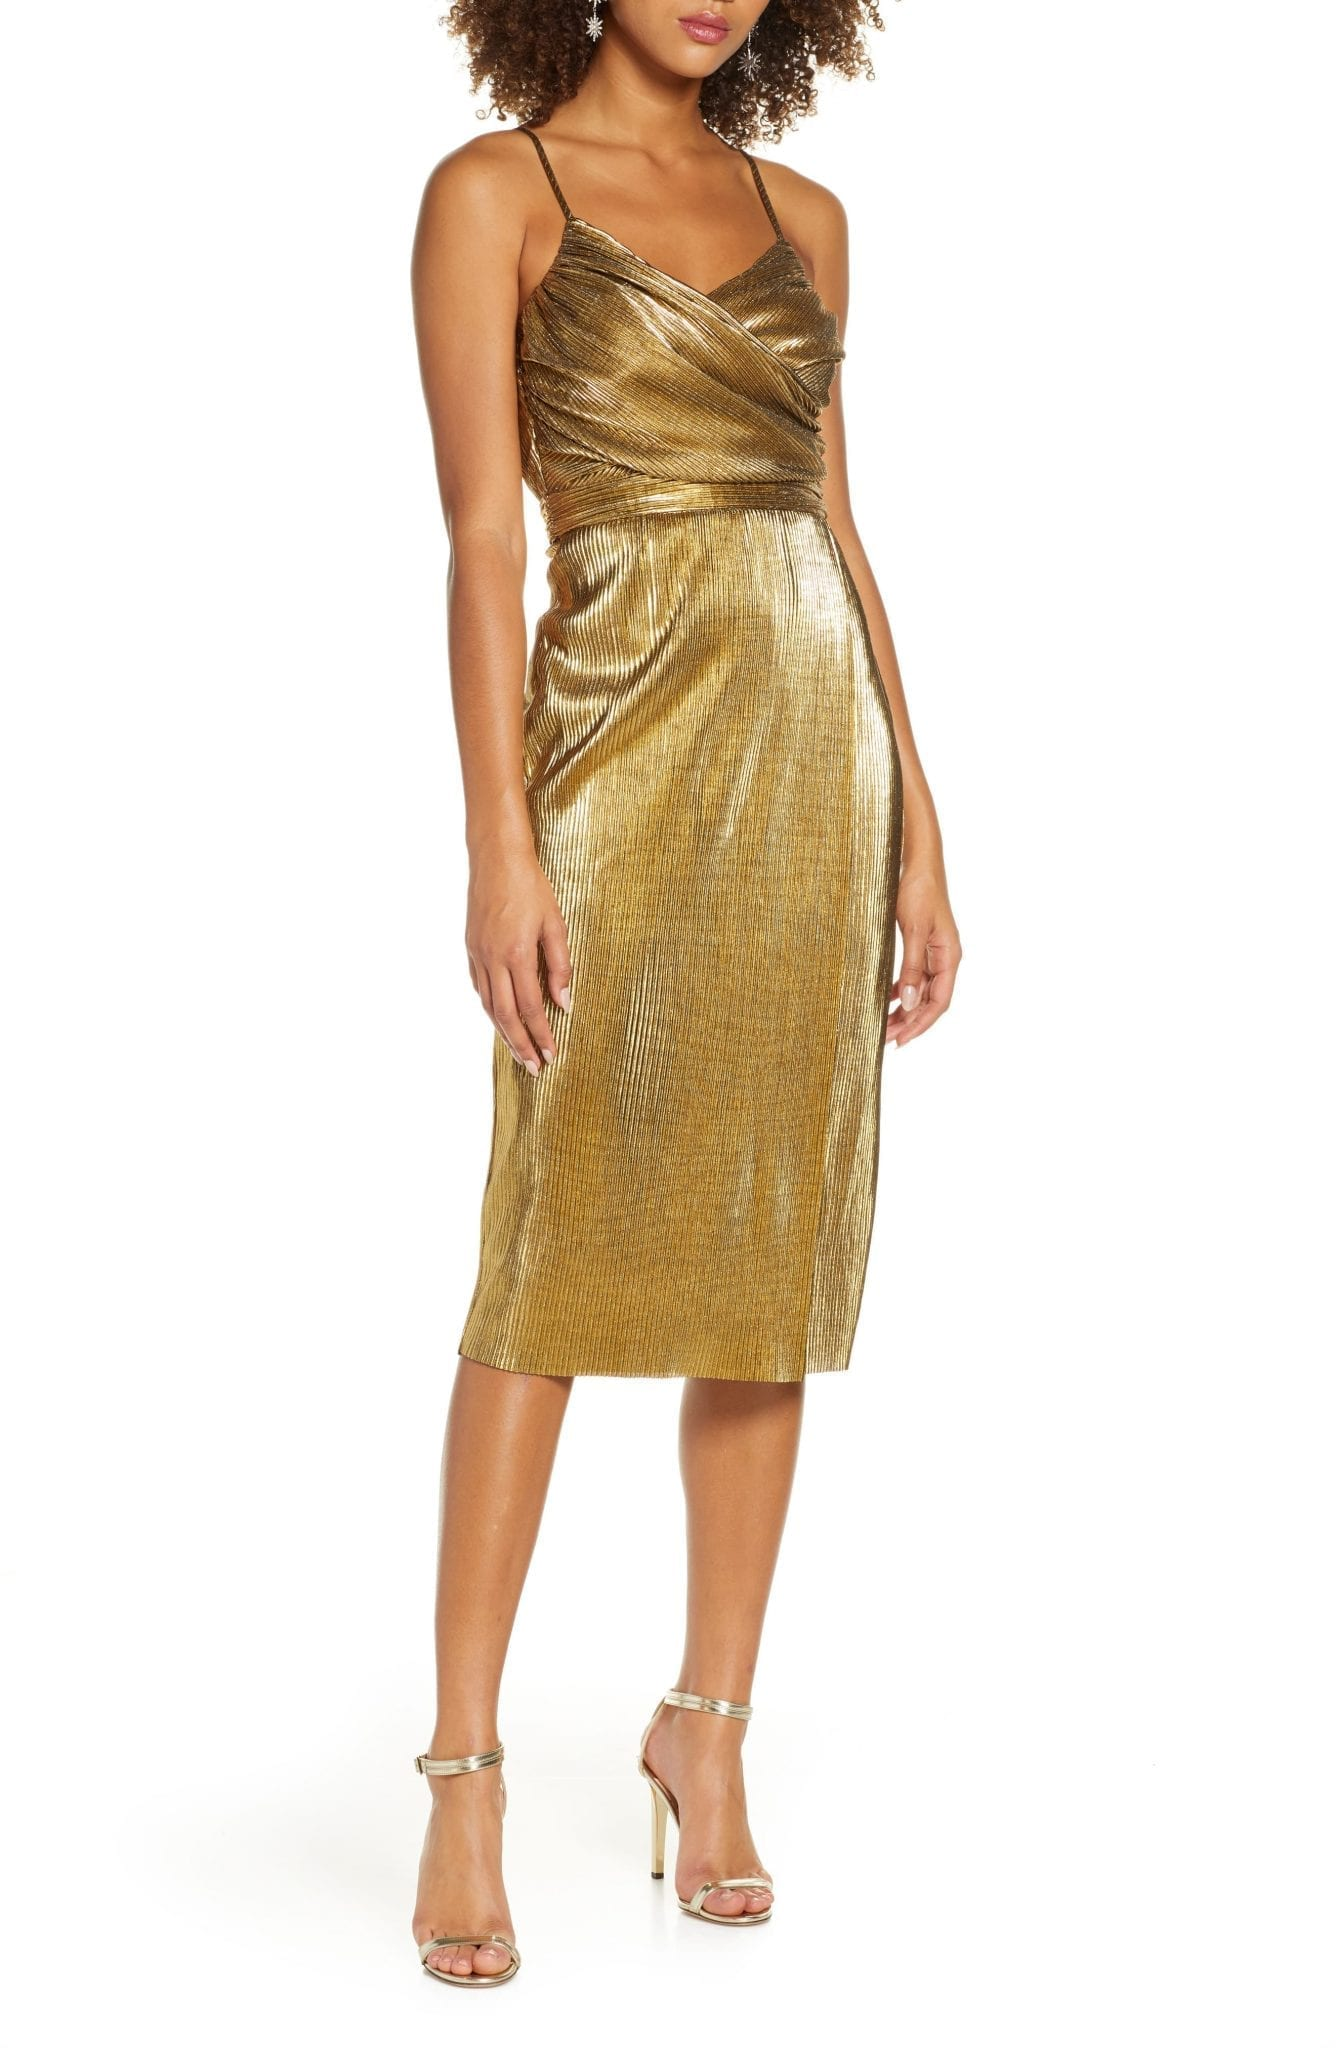 LULUS Love & Luxury Metallic Plissé Cocktail Dress